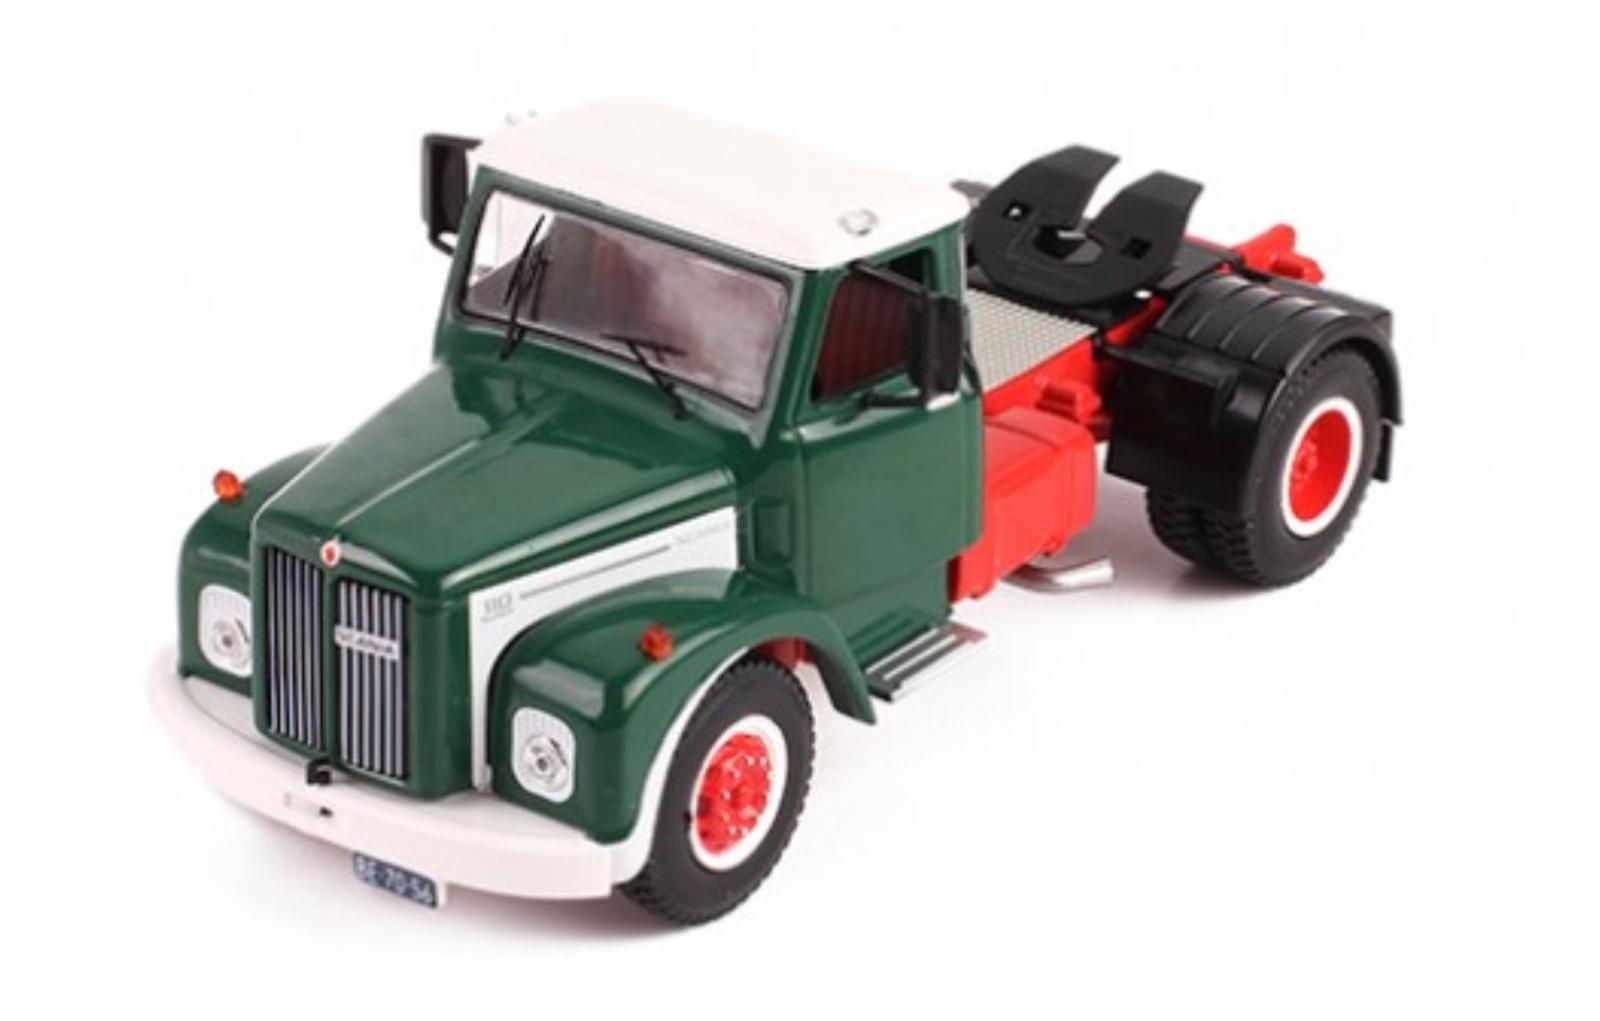 Scania 110 Super  grün weiss - 1 43 IXO       NEU <<<    Großartig